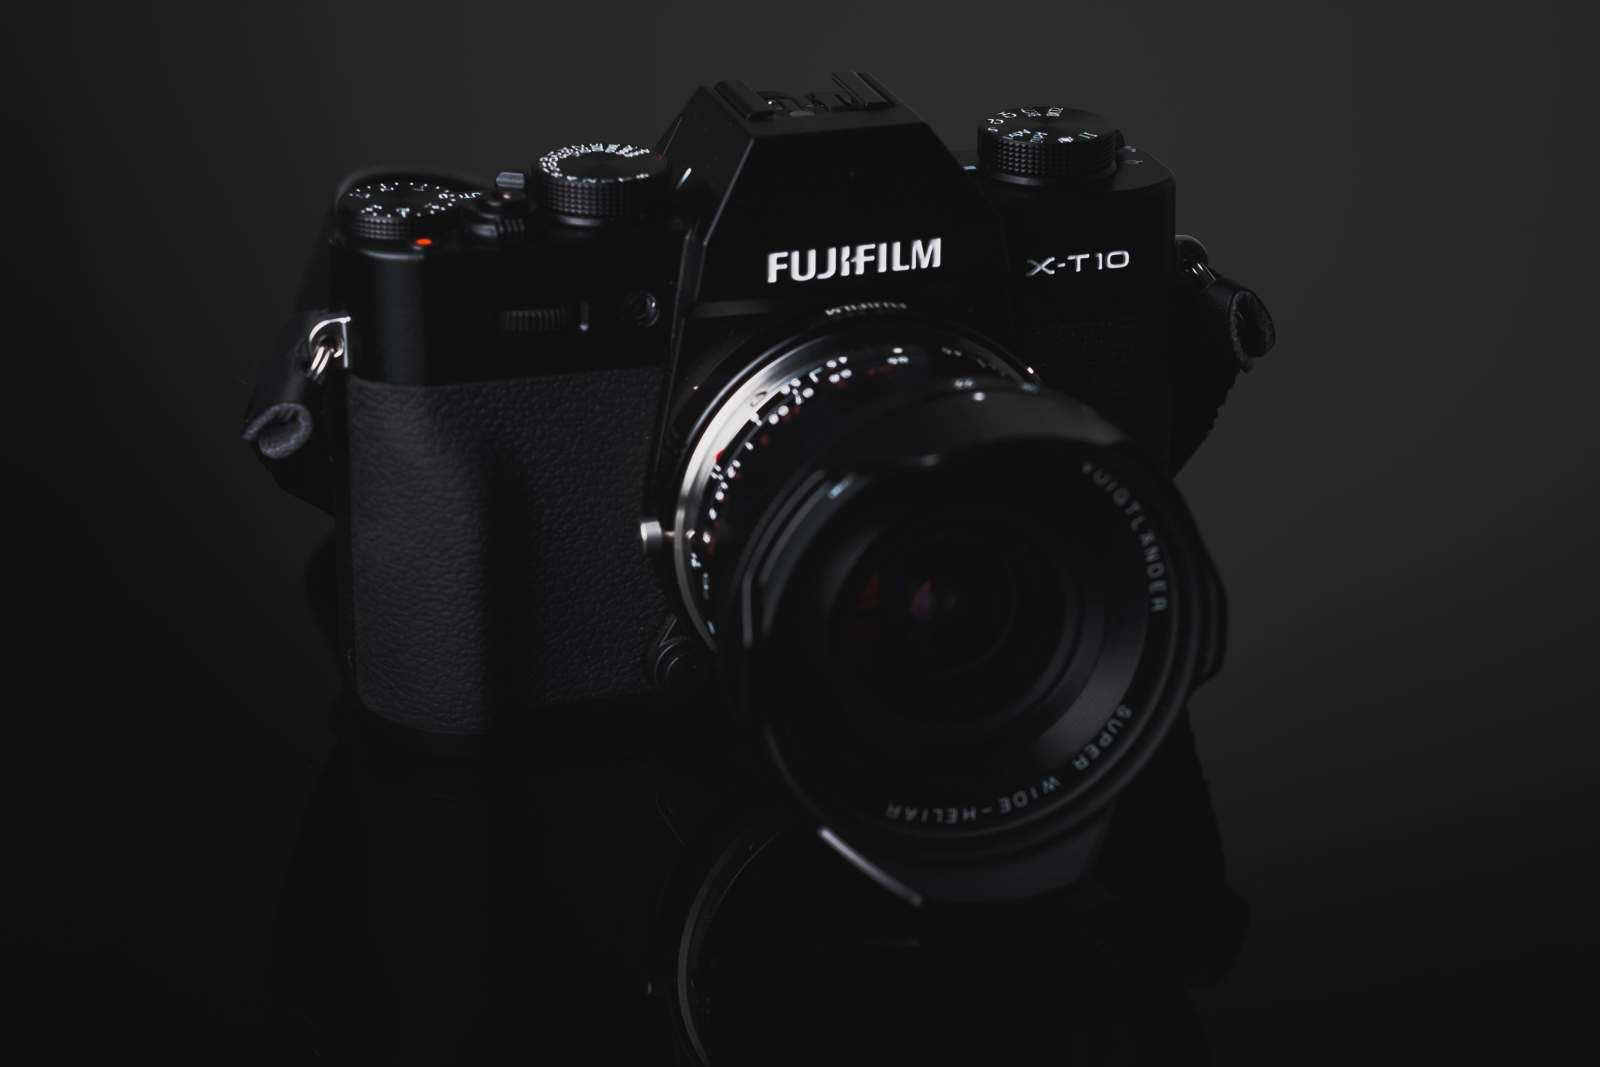 Fujifilm XT20 Accessories | Fujifilm XT10 Accessories